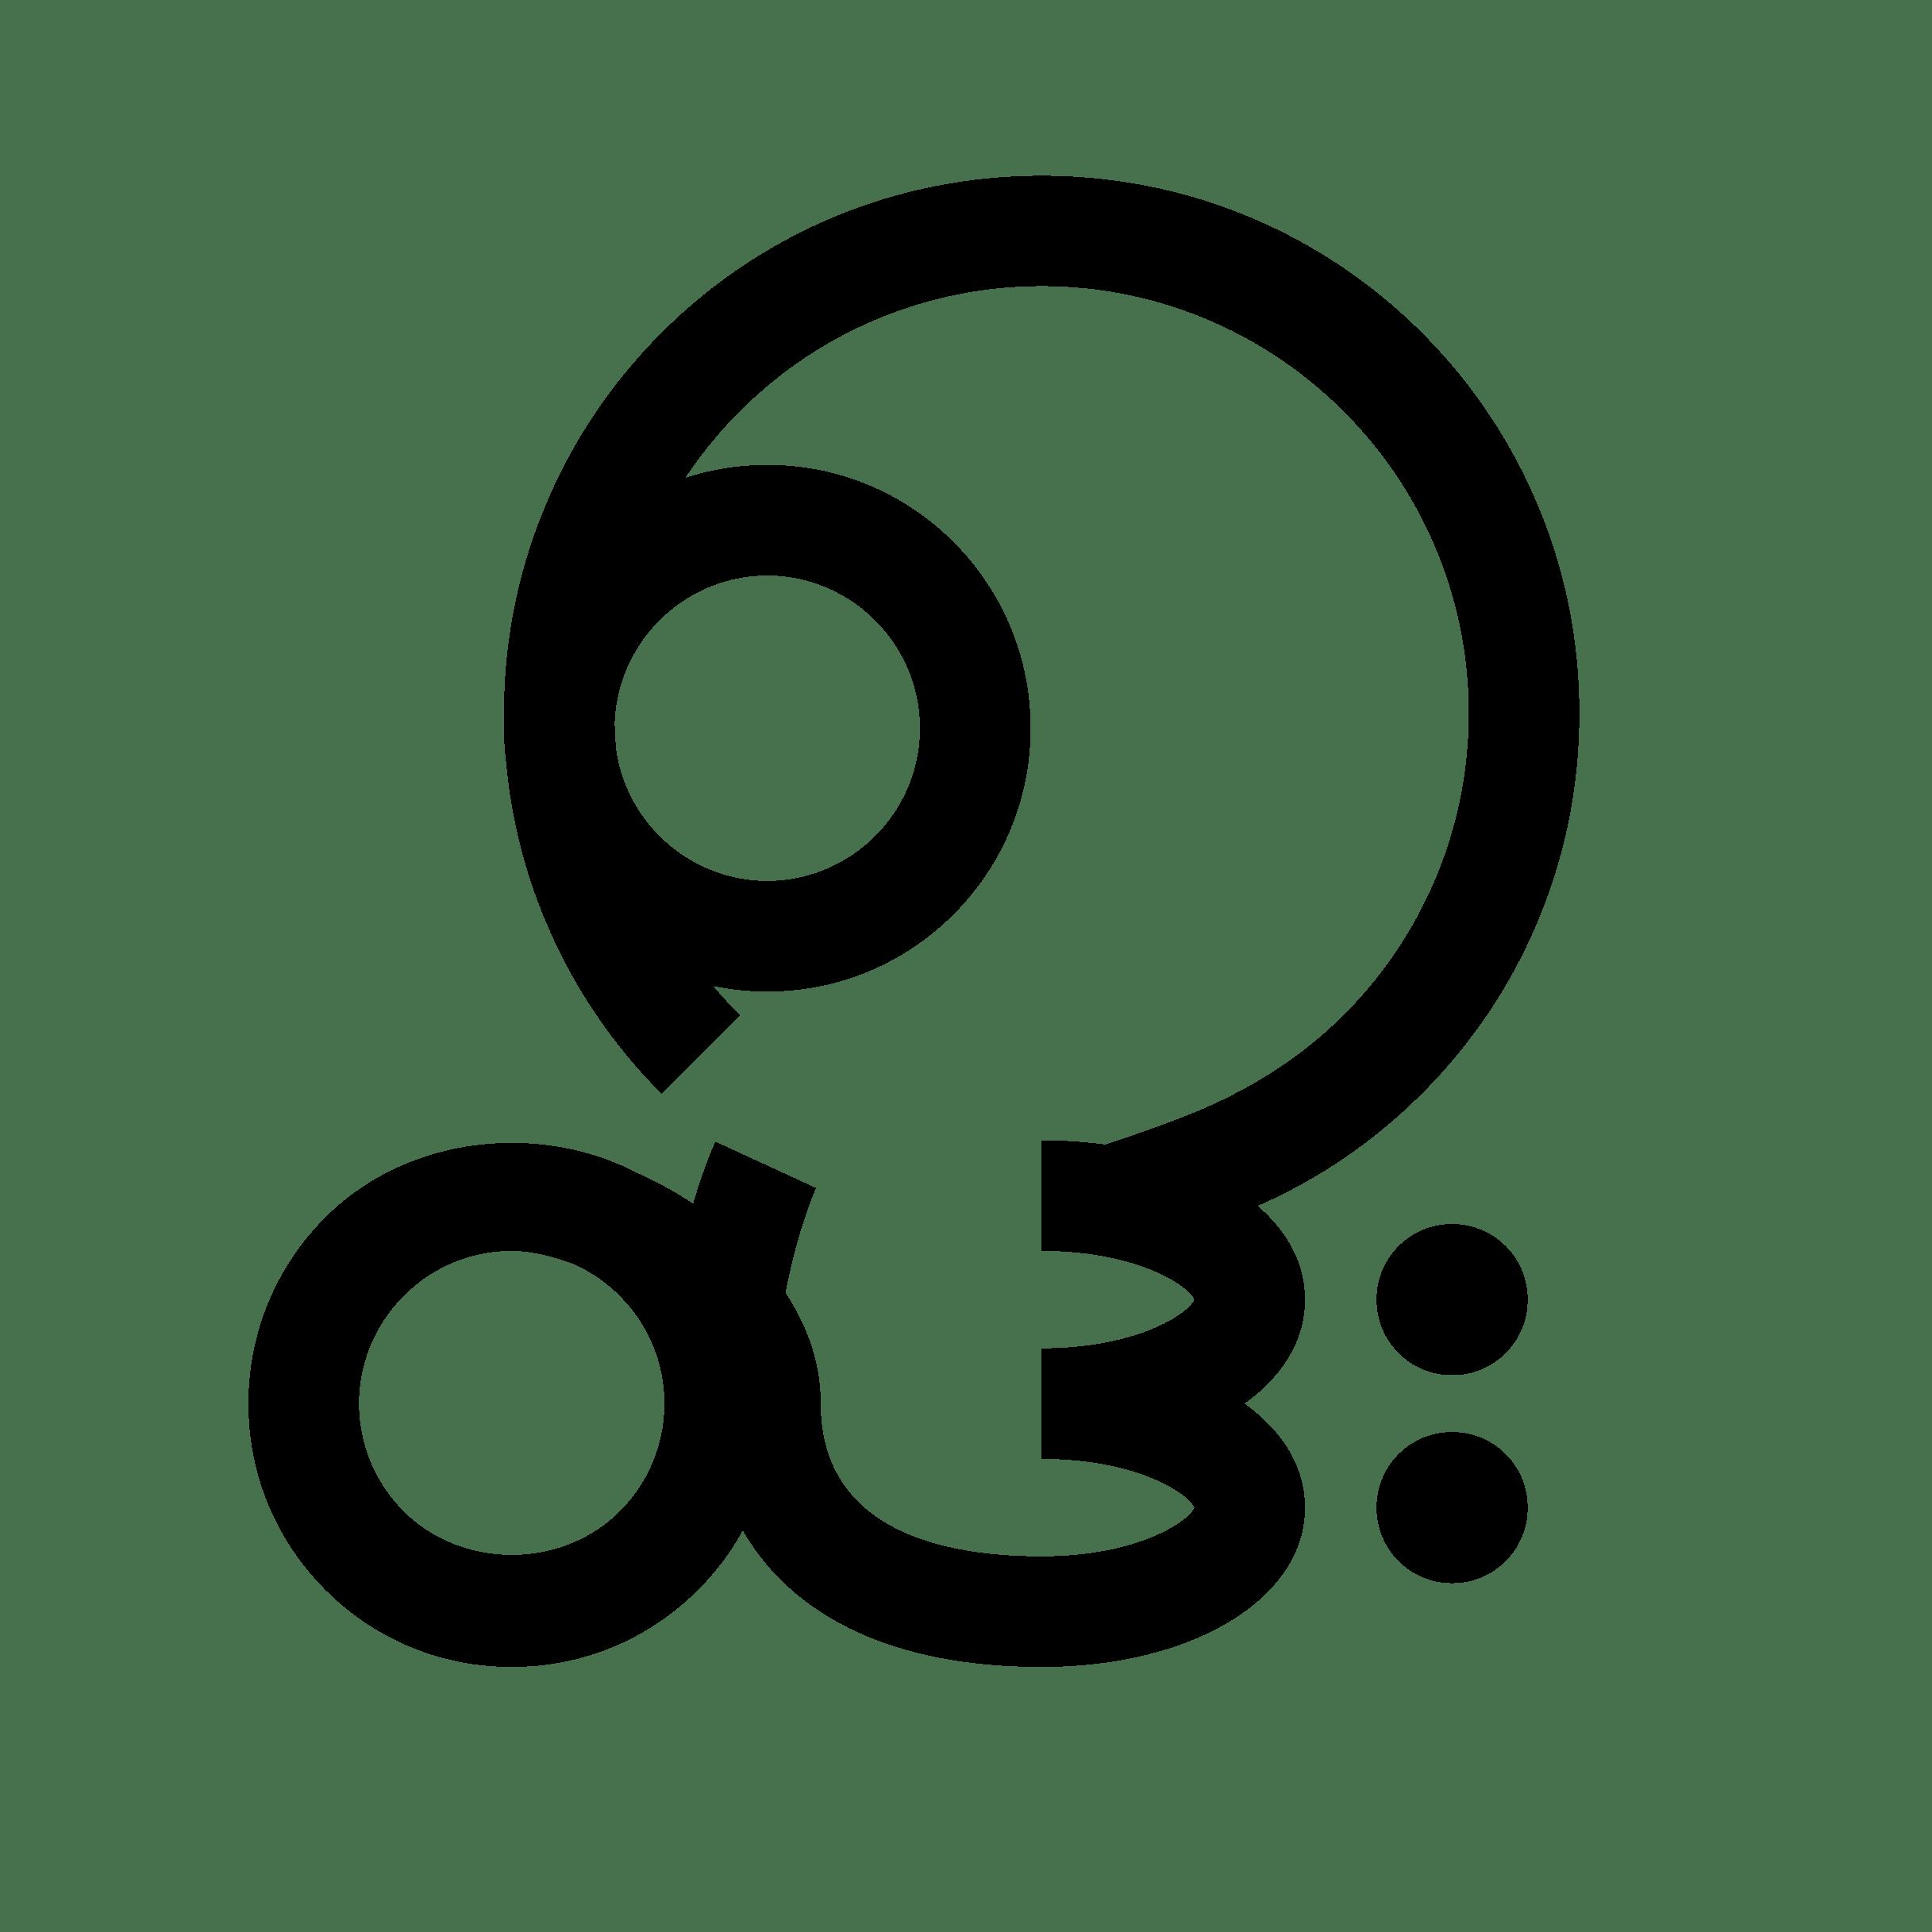 Arama ロゴ 01